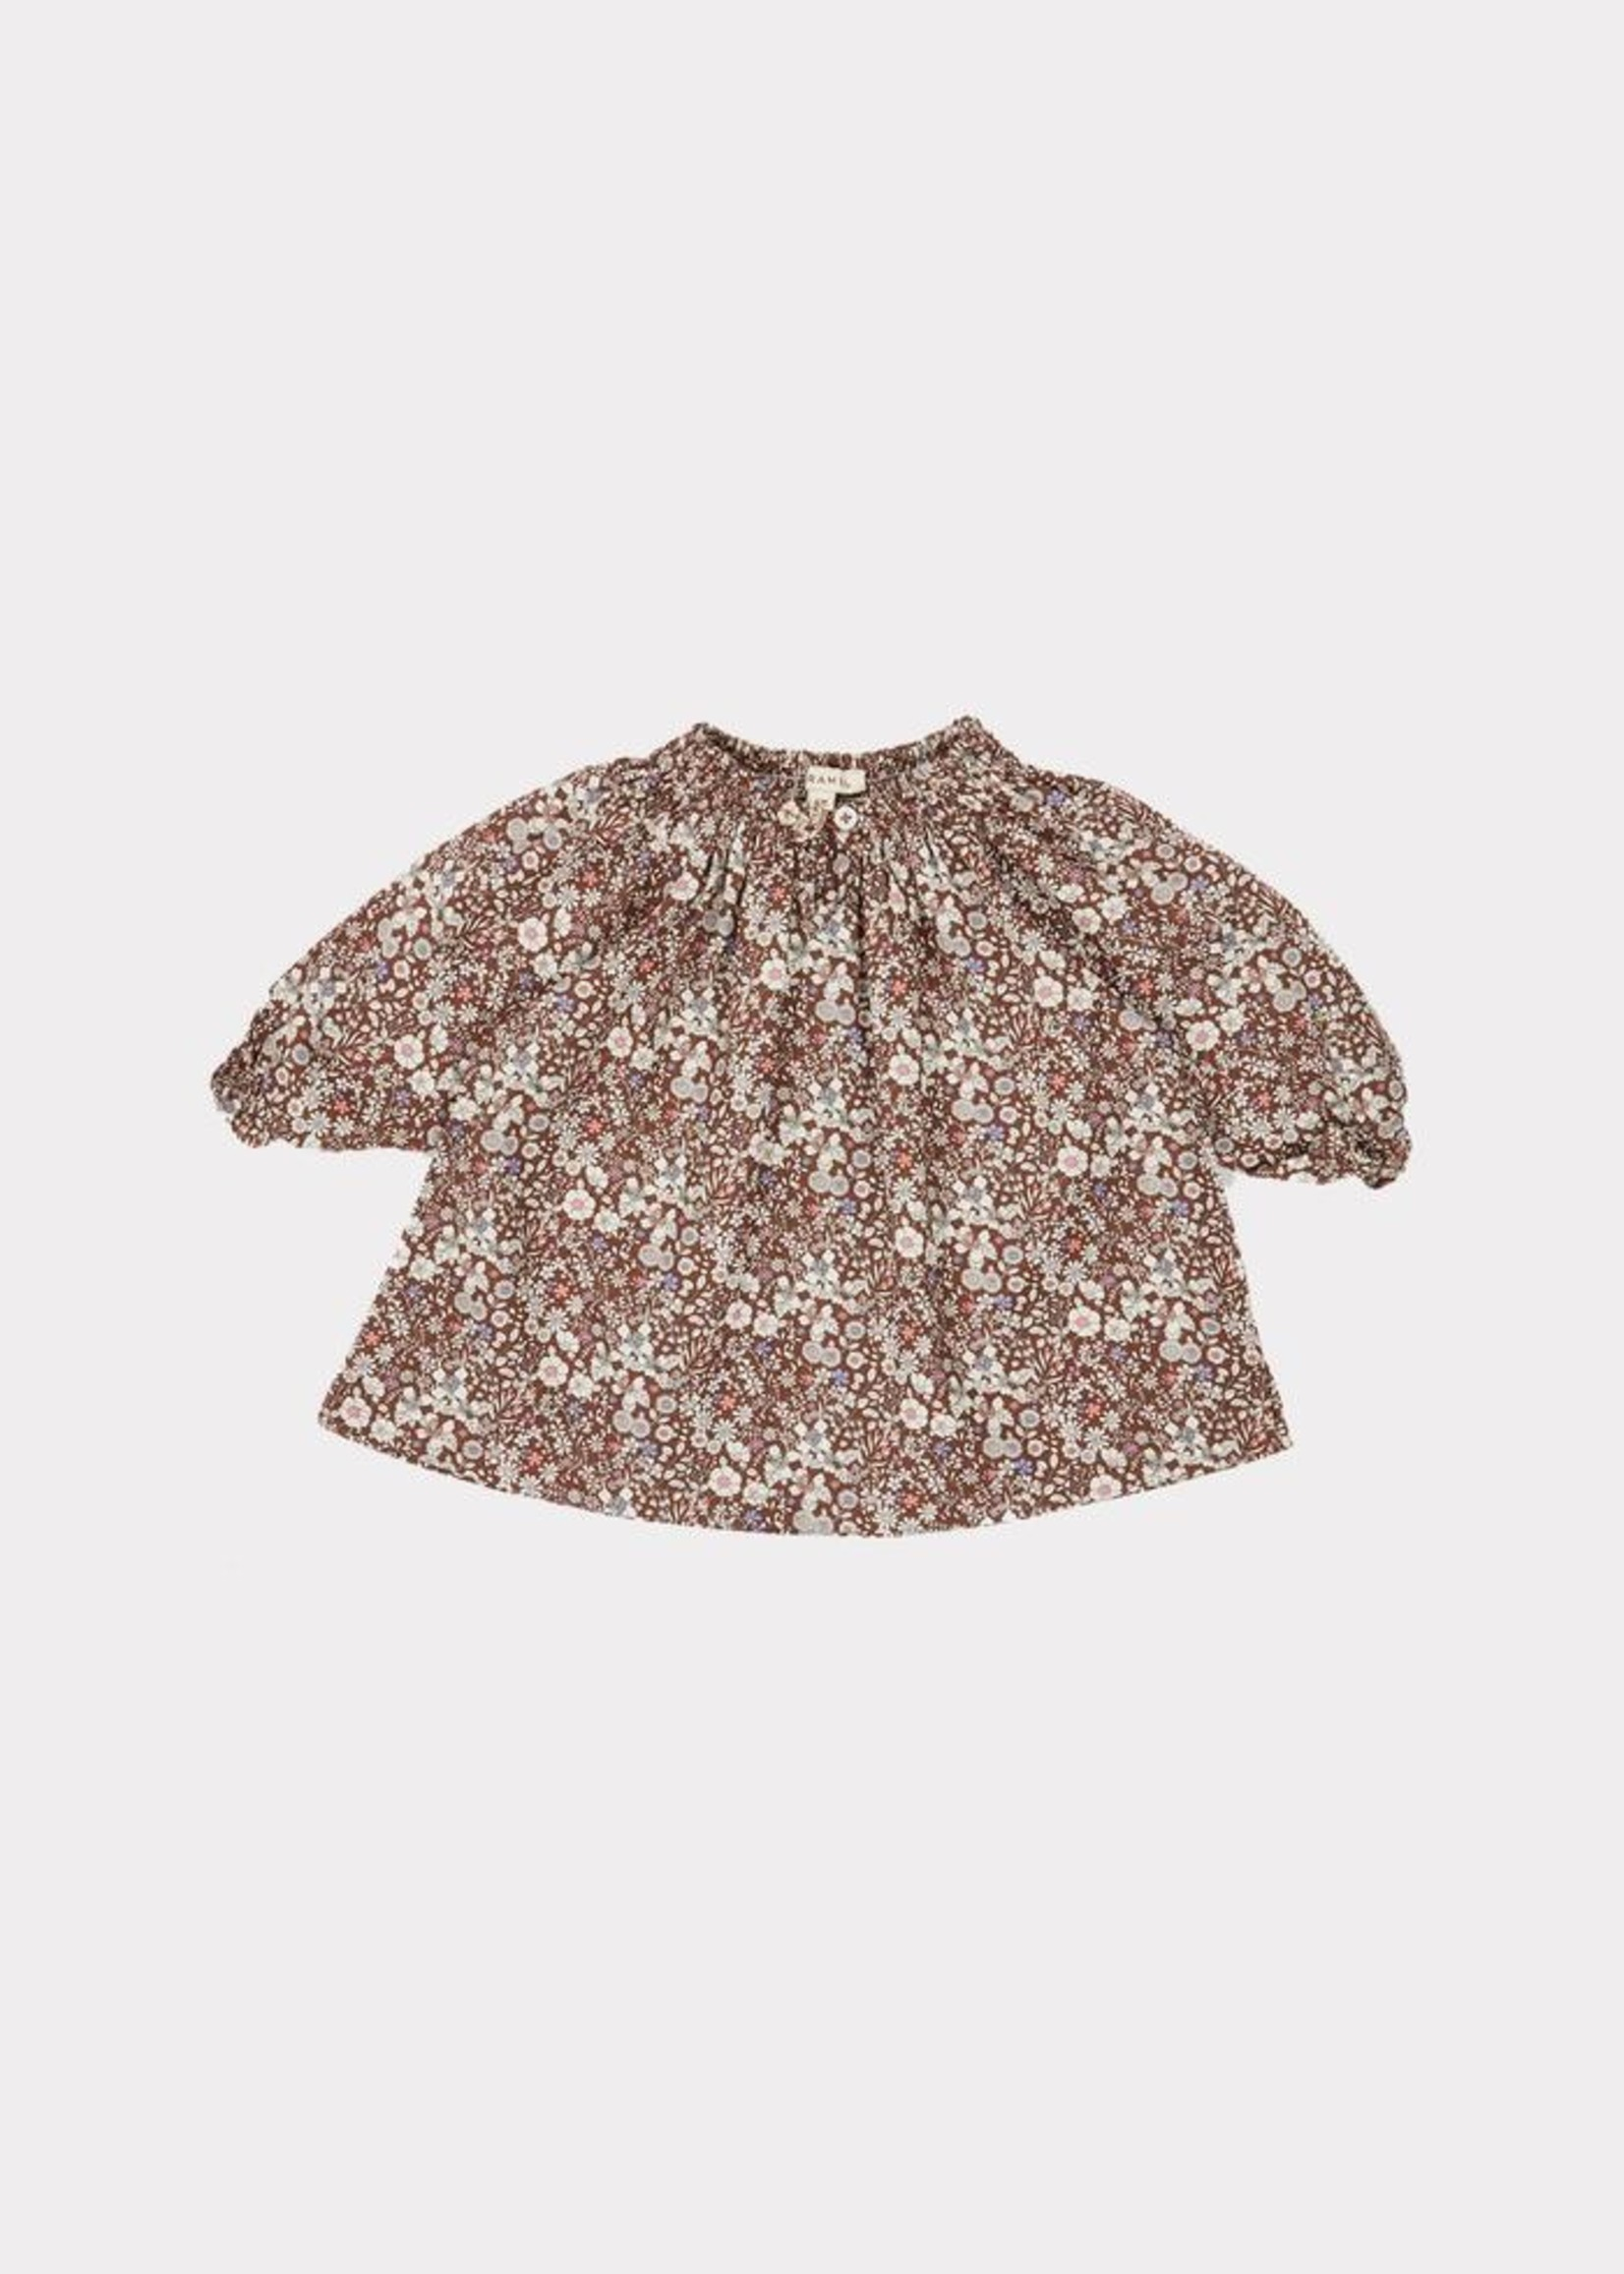 Caramel Caramel-ss21 AROWANA baby DRESS S21DF Brown 24m